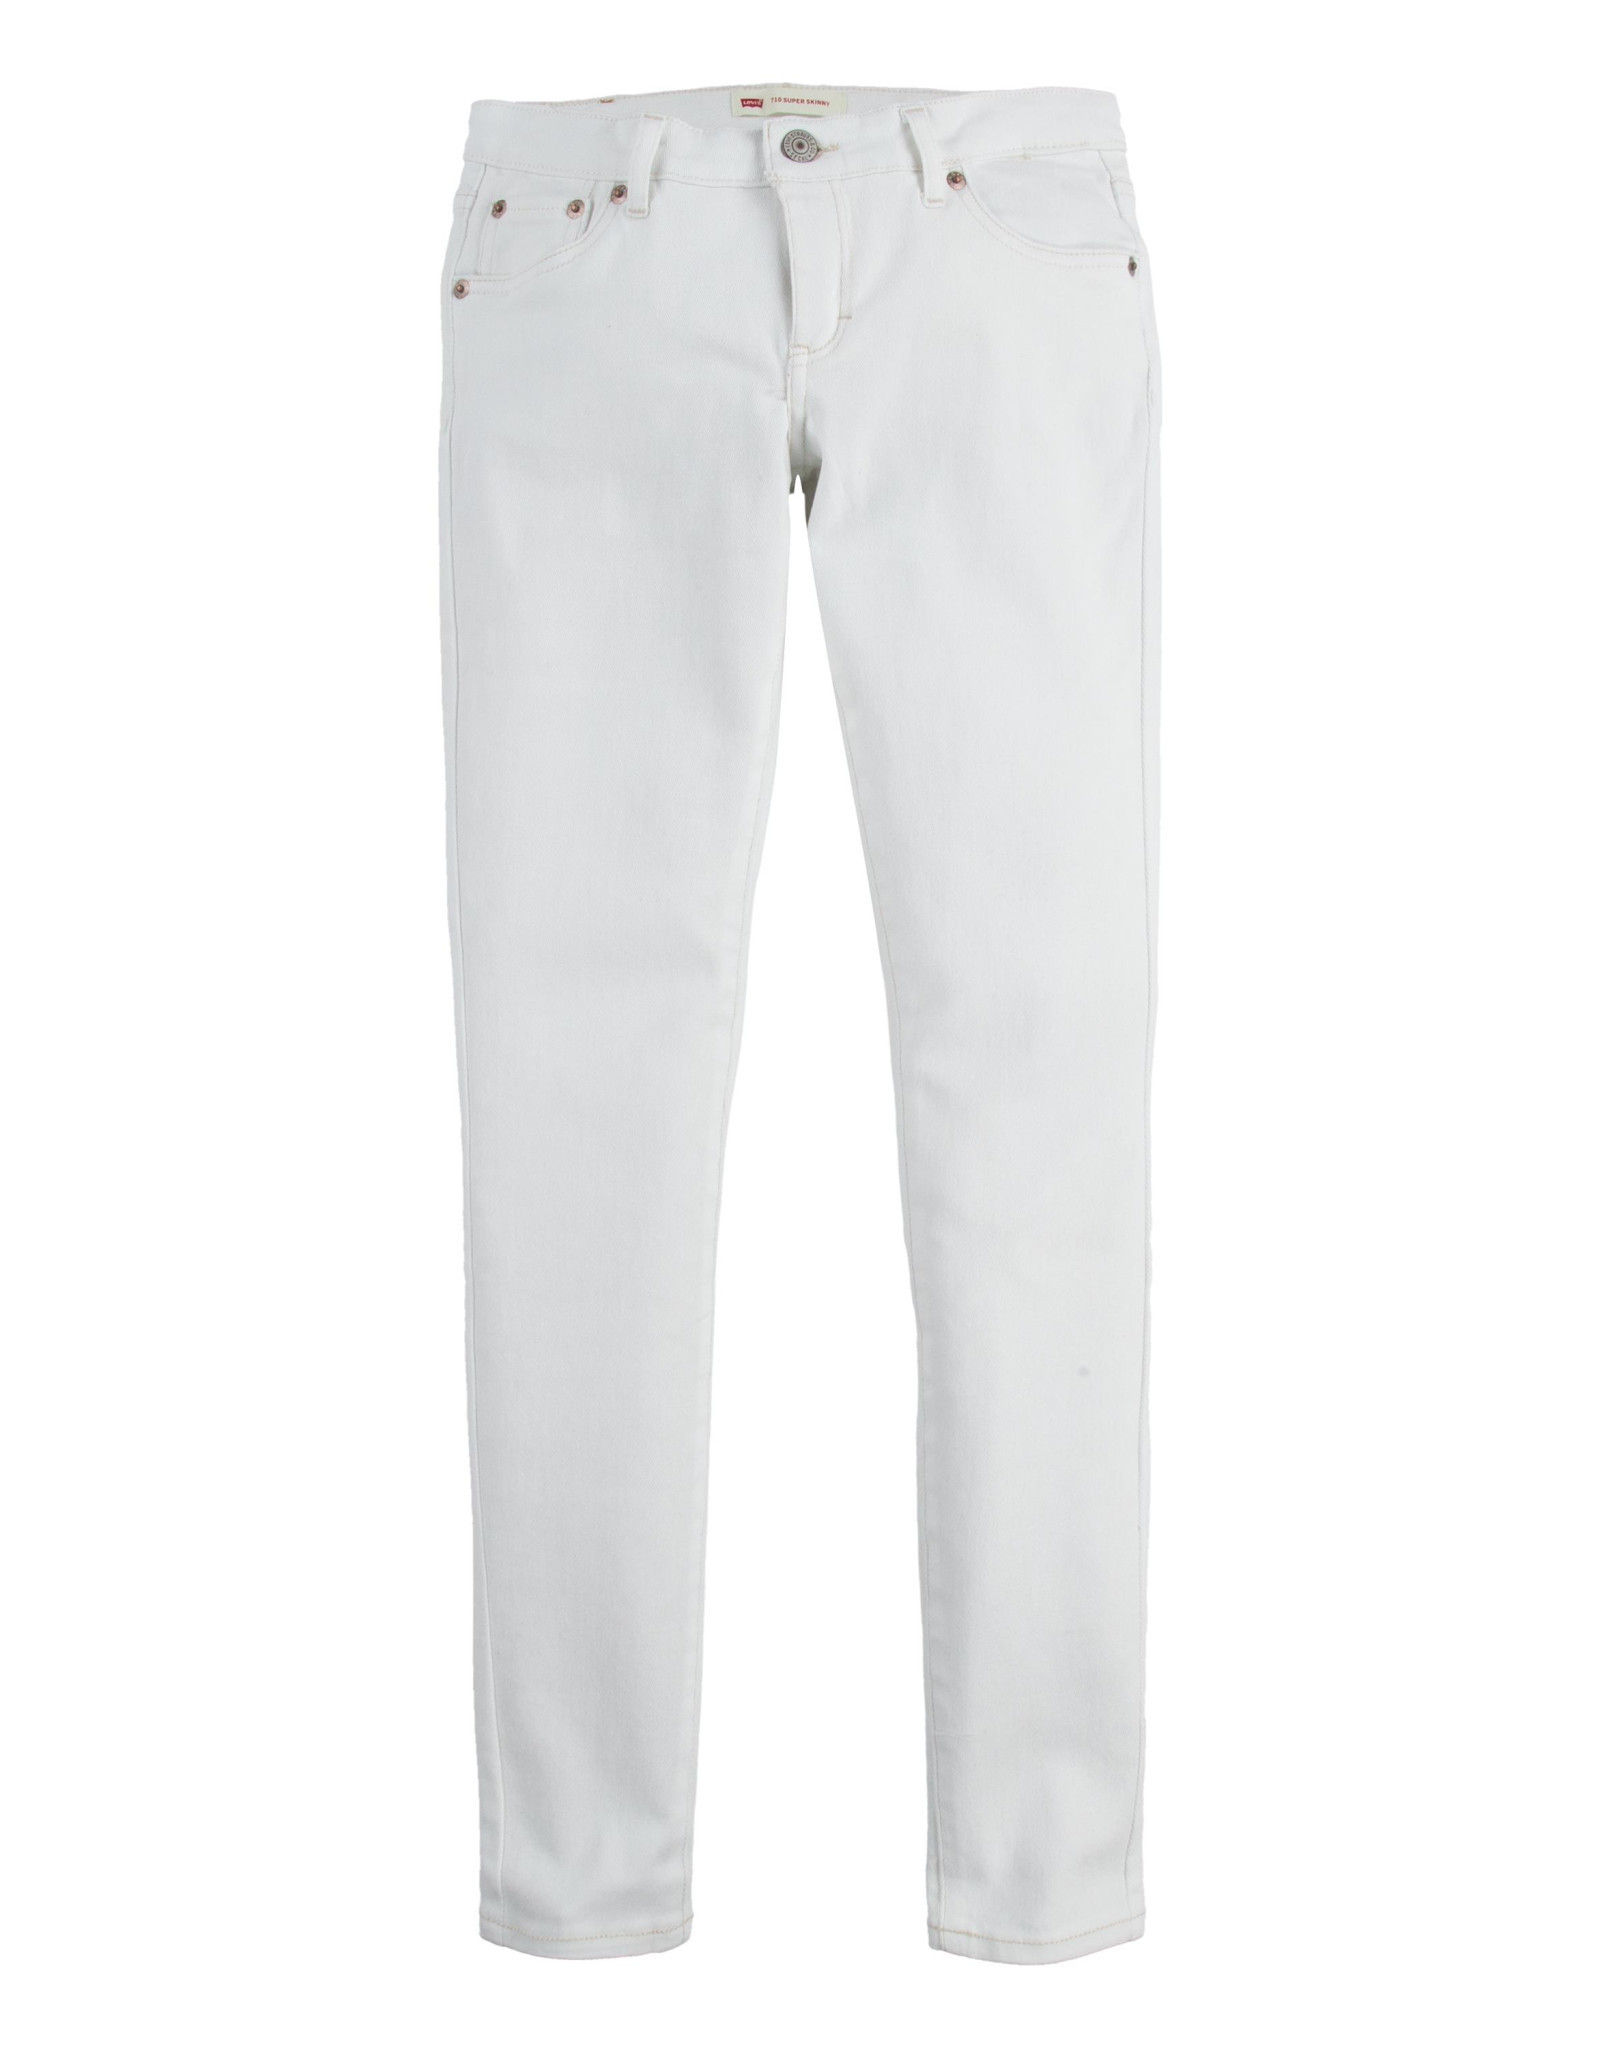 LEVI'S LEVI'S lvg 710 super skinny jean white